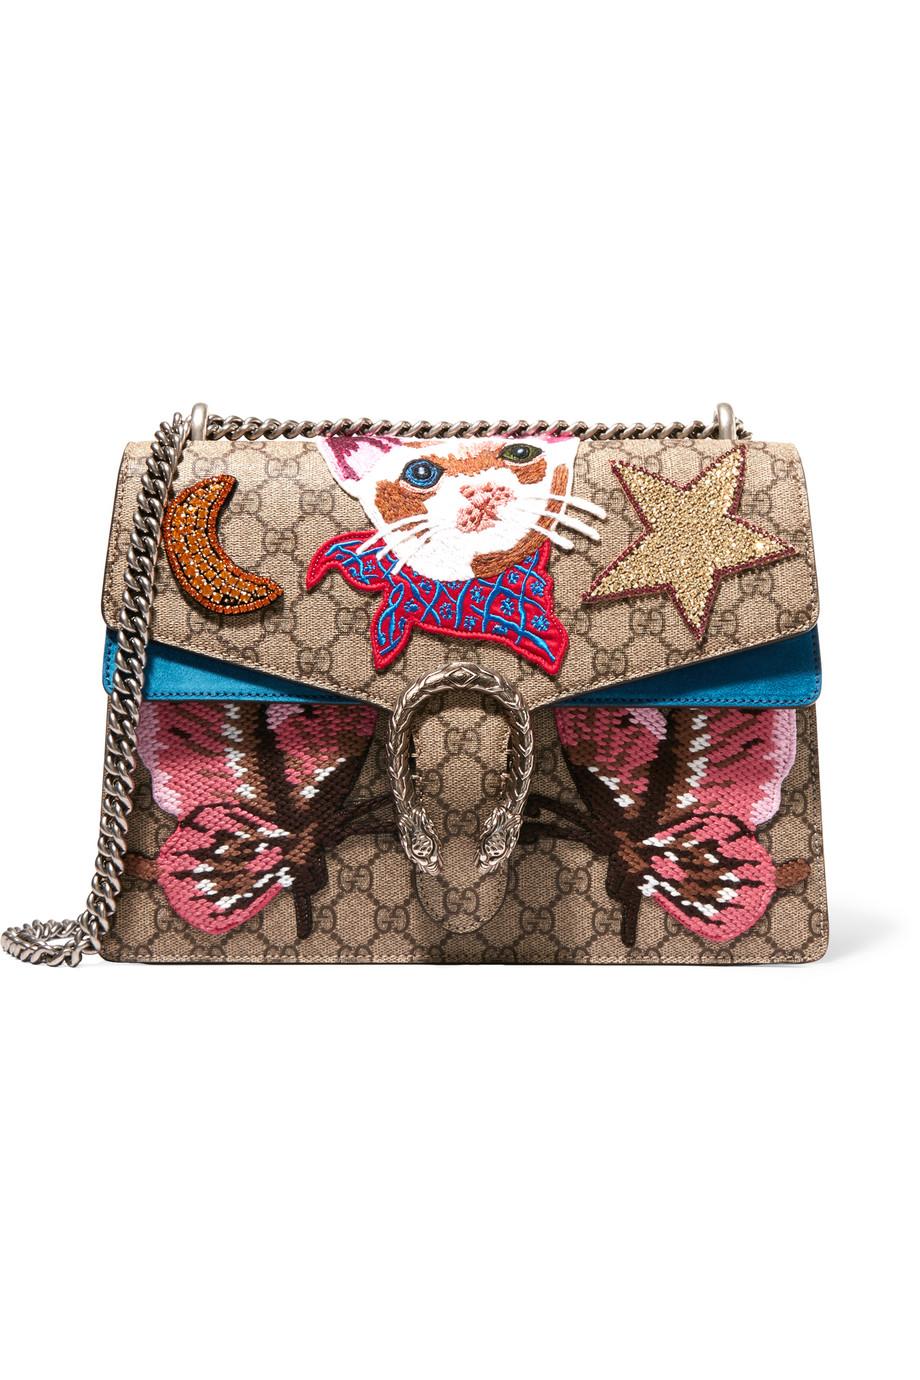 Gucci Dionysus Large Appliquéd Coated Canvas and Suede Shoulder Bag, Beige/Pink, Women's